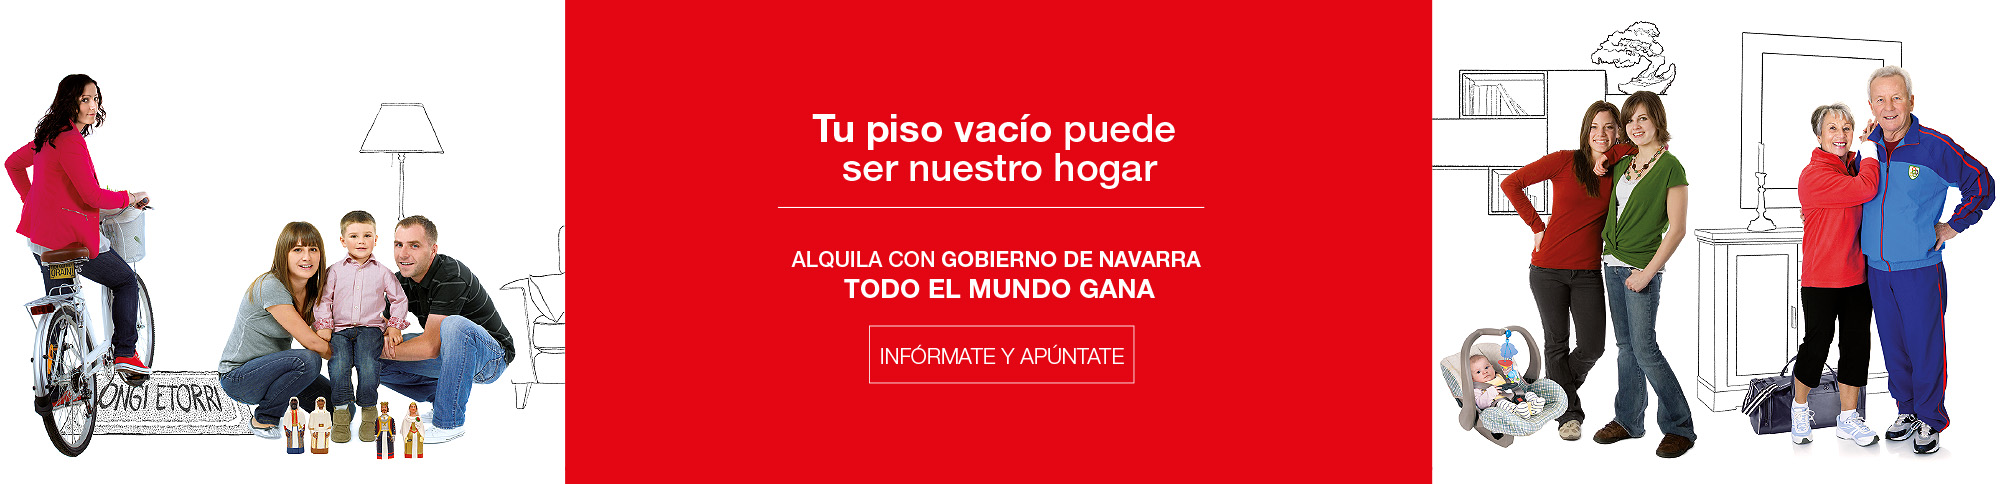 banner-navarra_es-esp